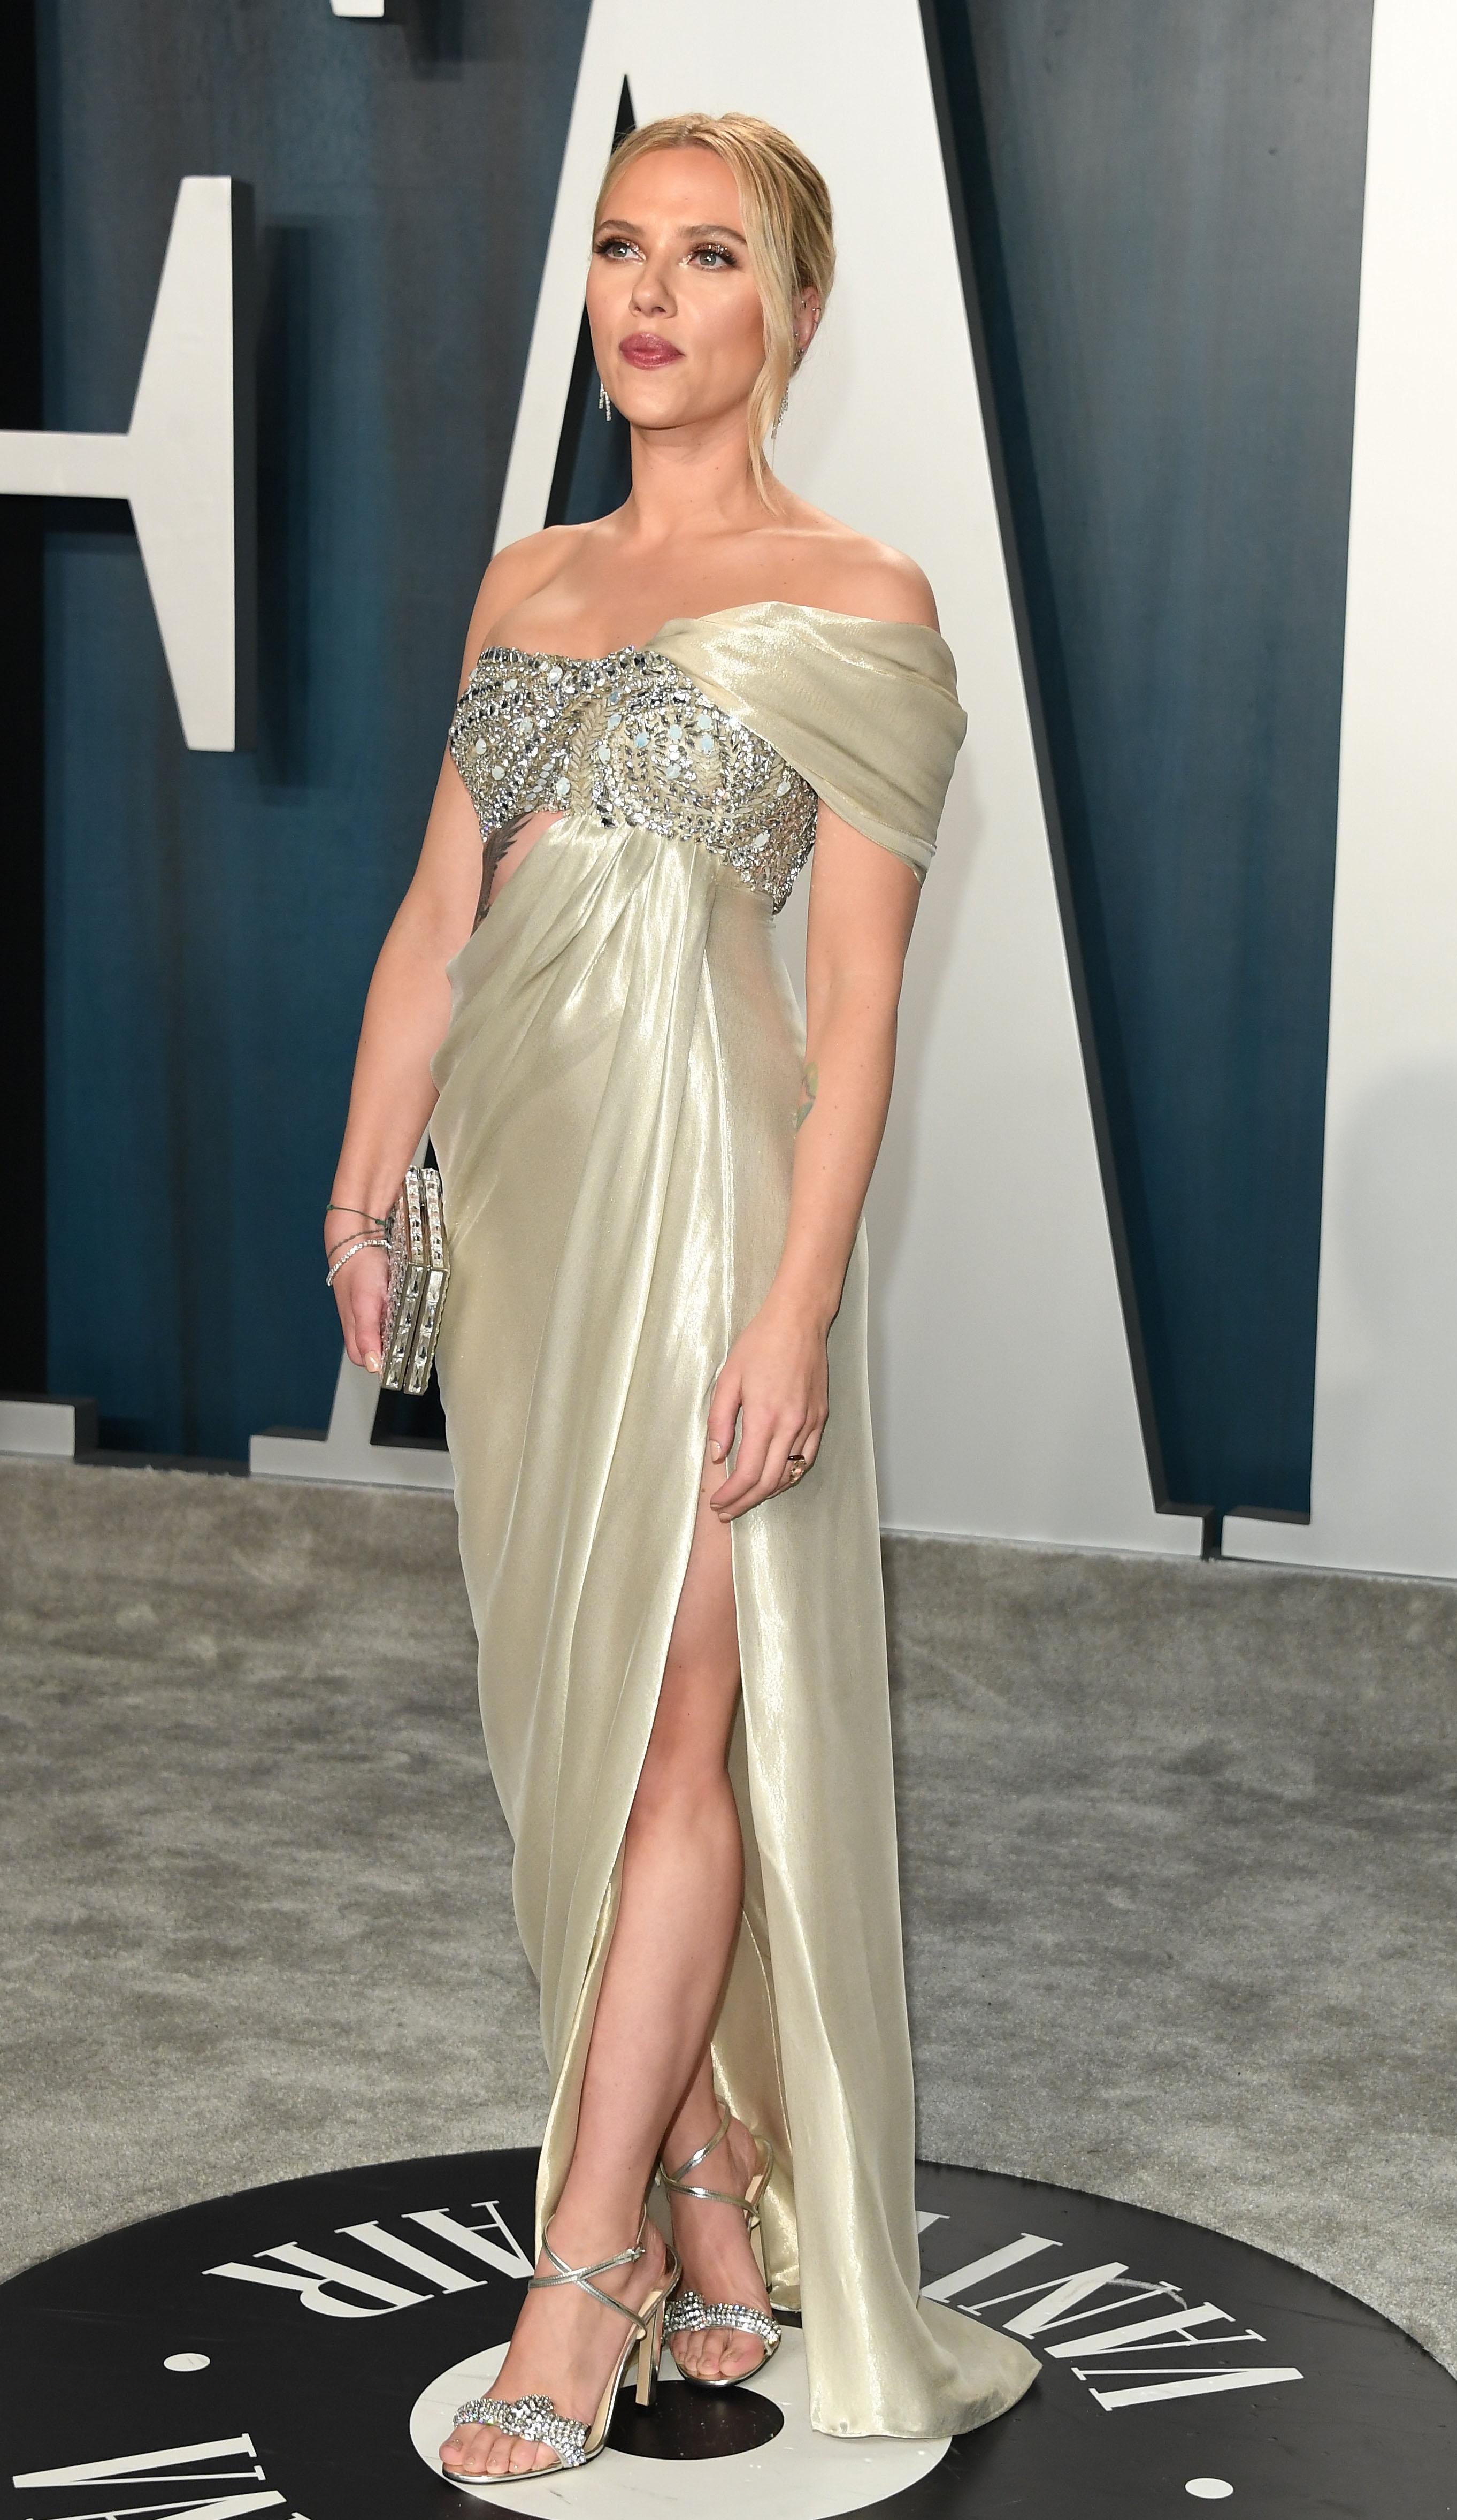 Scarlett Johansson wearing THYRA